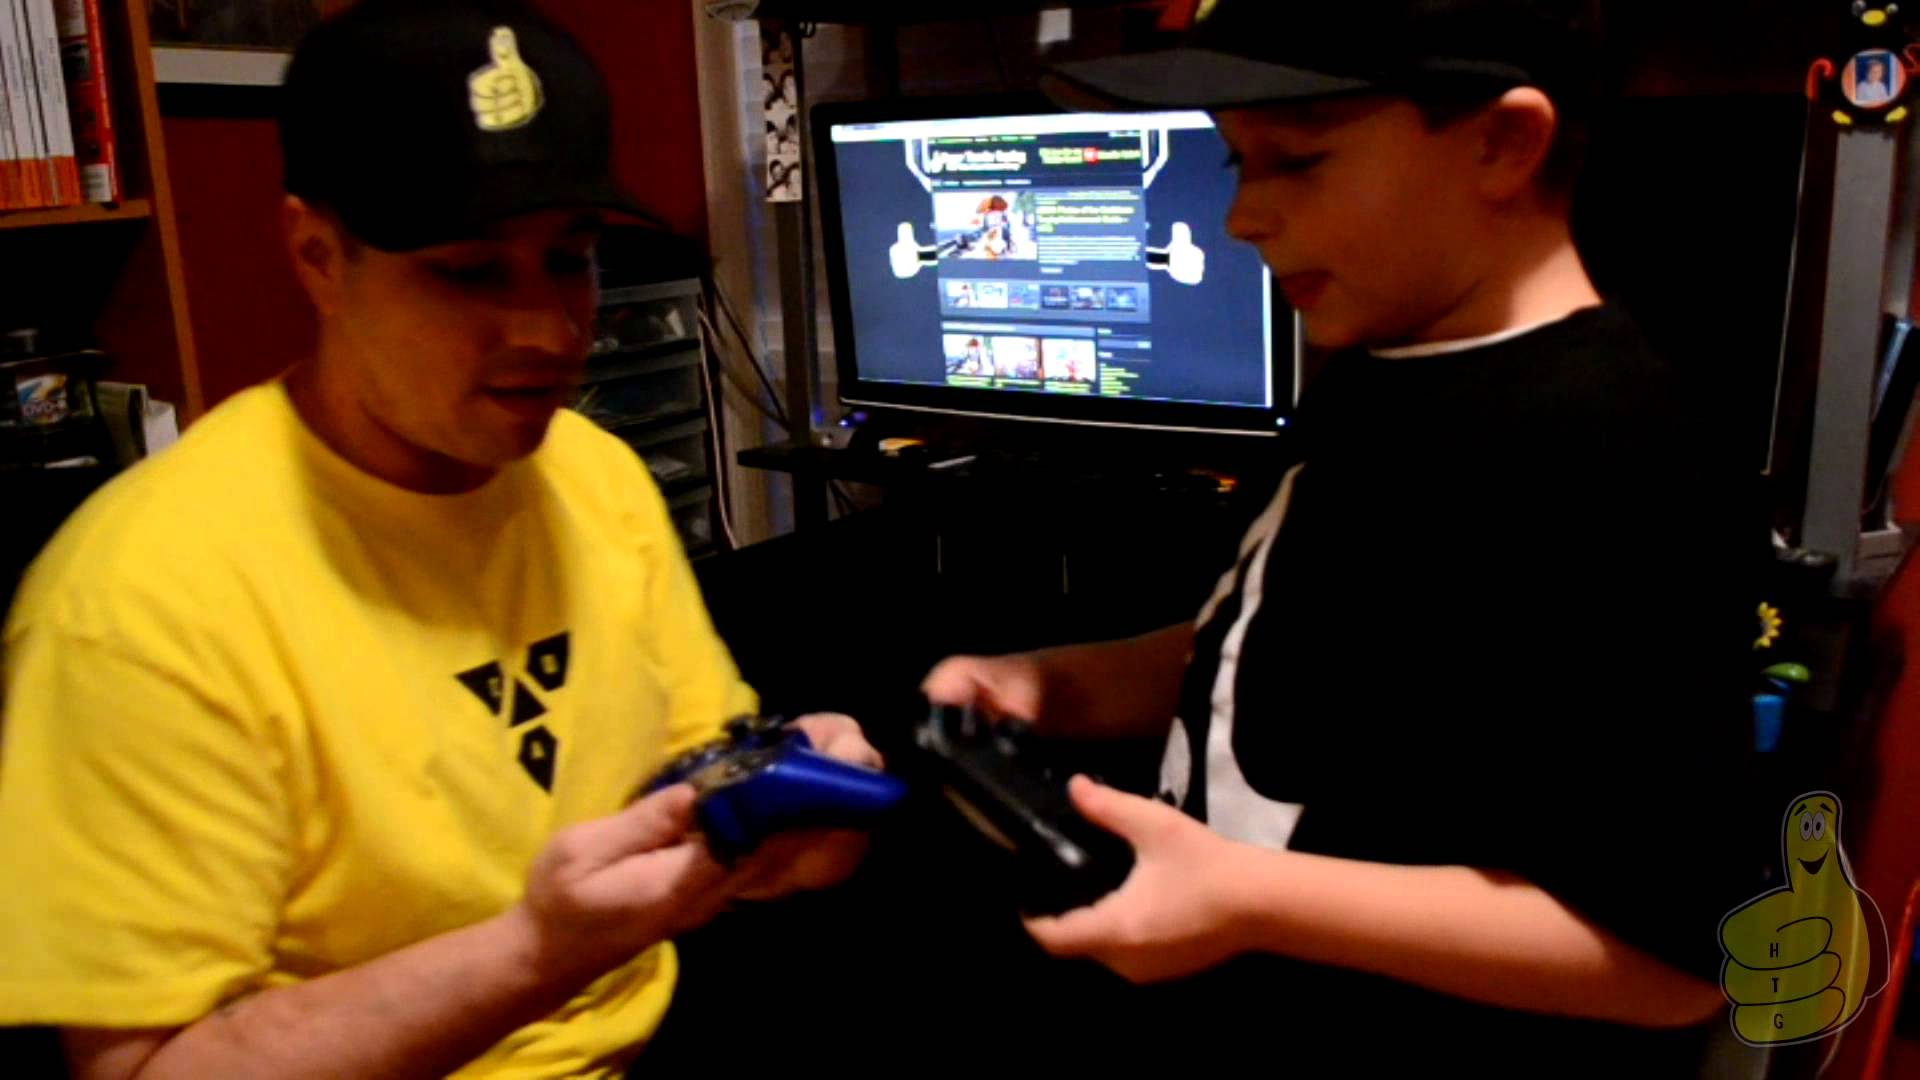 Assassin's Creed IV: Black Flag T-Shirt Contest – HTG